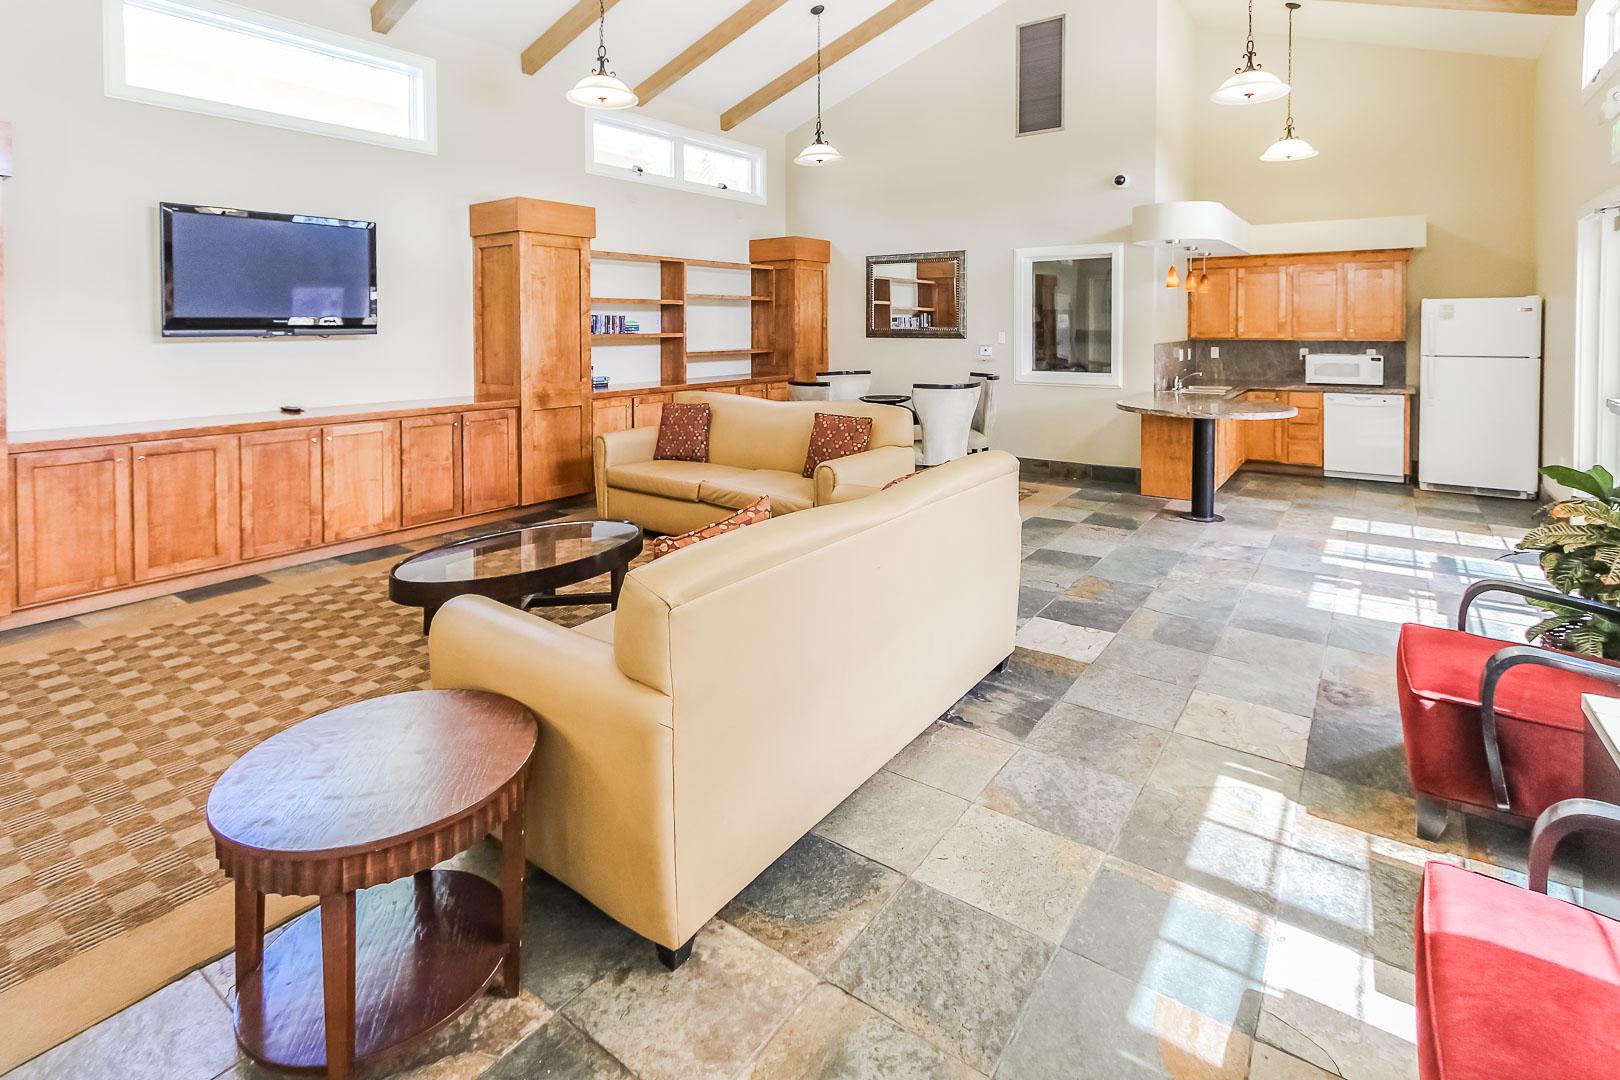 A community kitchen area at VRI's Winner Circle Resort in California.